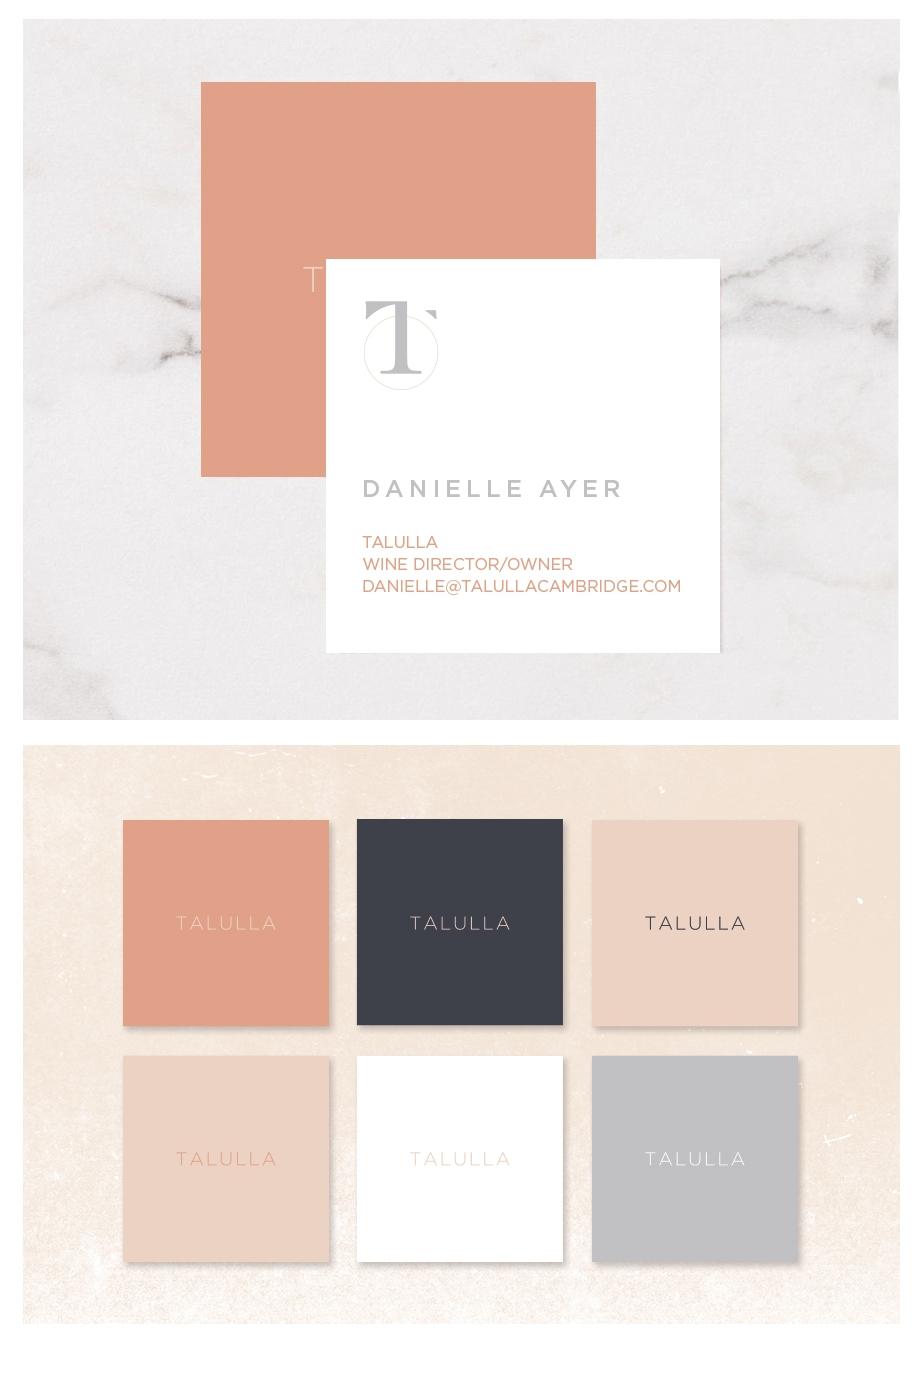 Tallula_businesscards2.jpg